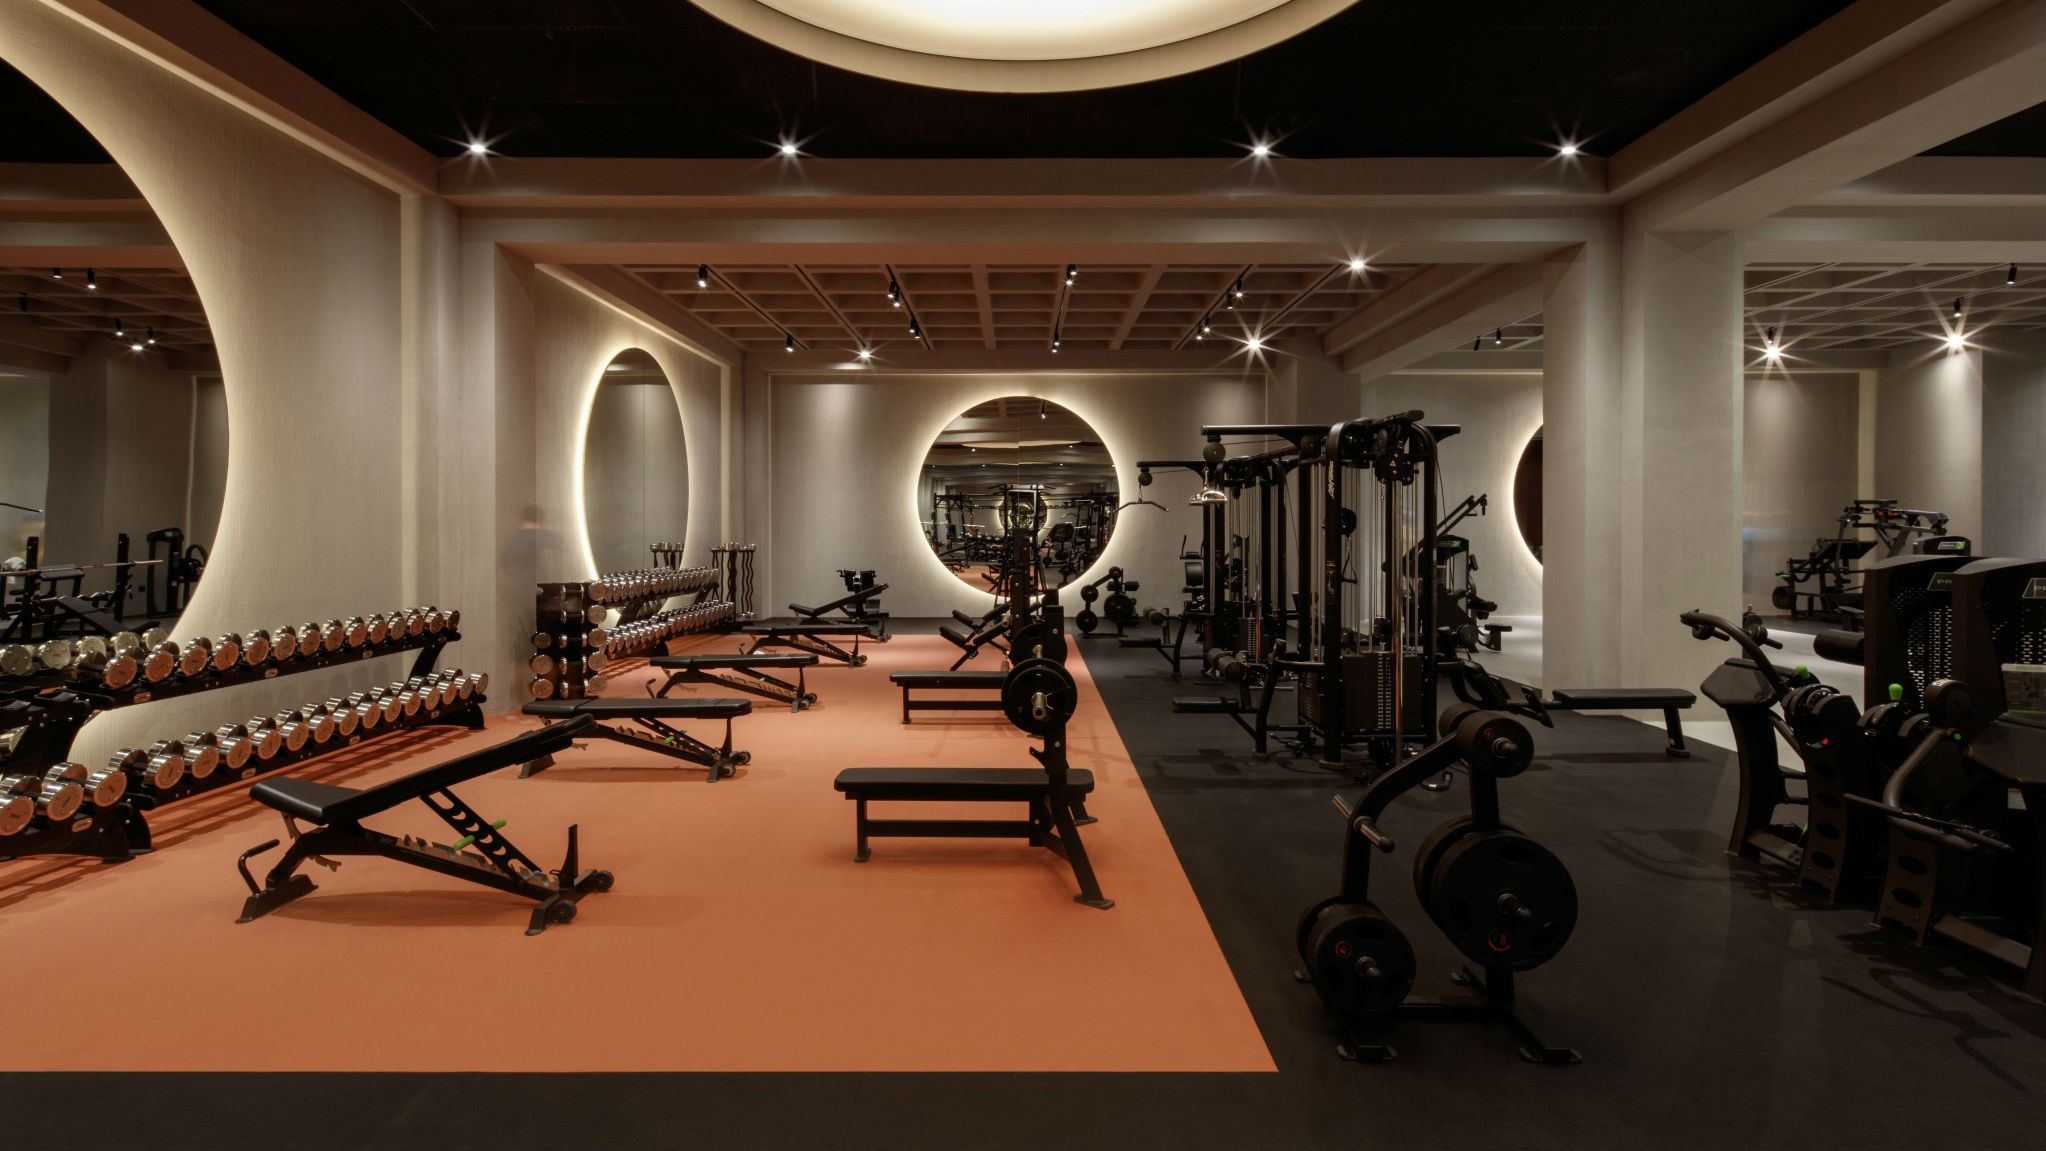 Warehouse Gym Springs by VSHD Design